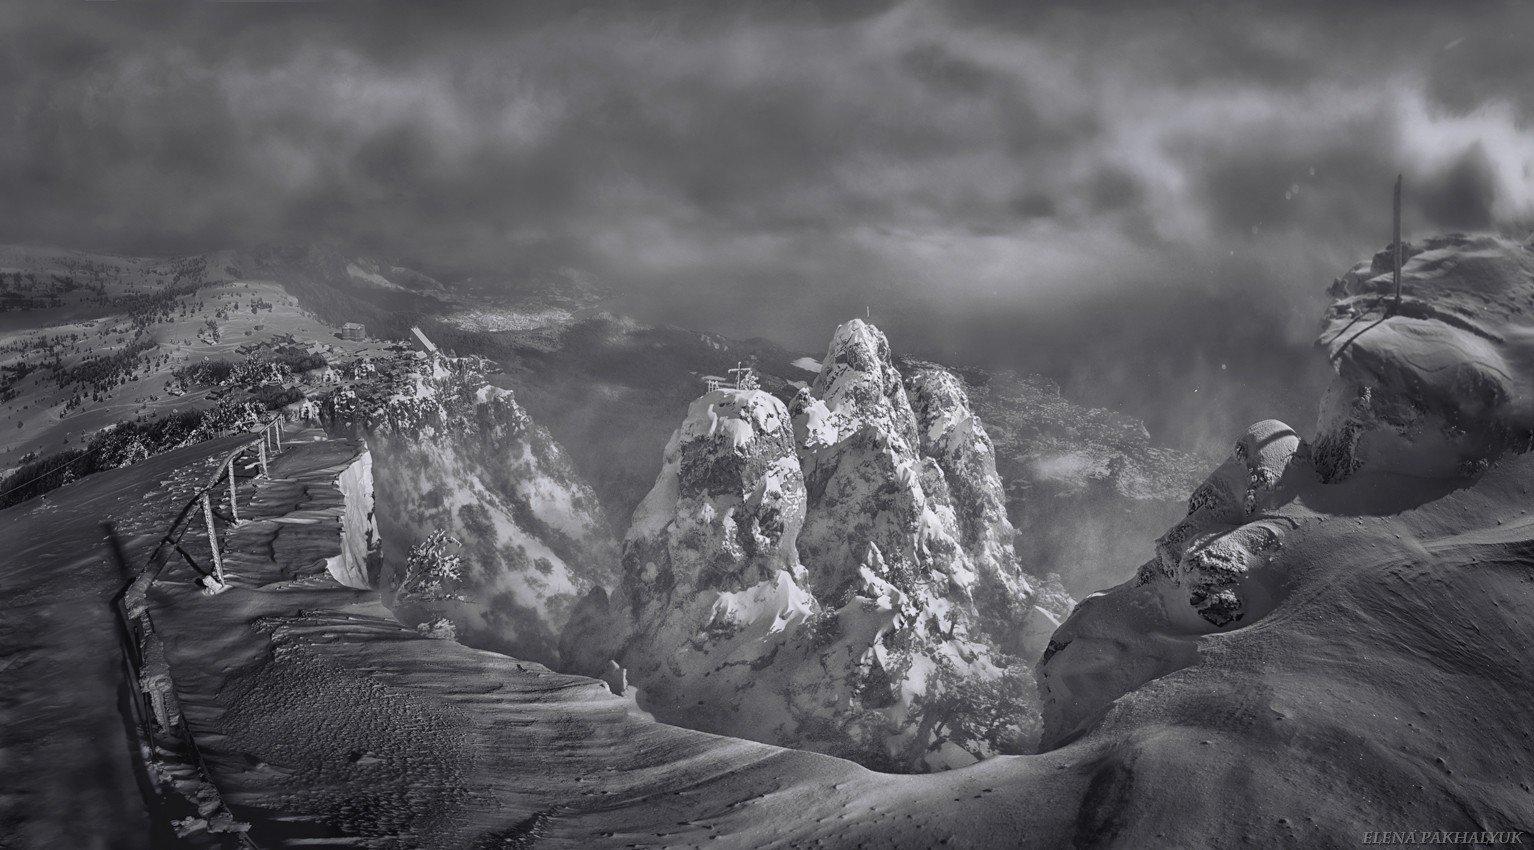 крым,айпетри,гора,черно белый,снег,зима,вершина,белый,облака,туман,солнце,пурга,пейзаж, Elena Pakhalyuk